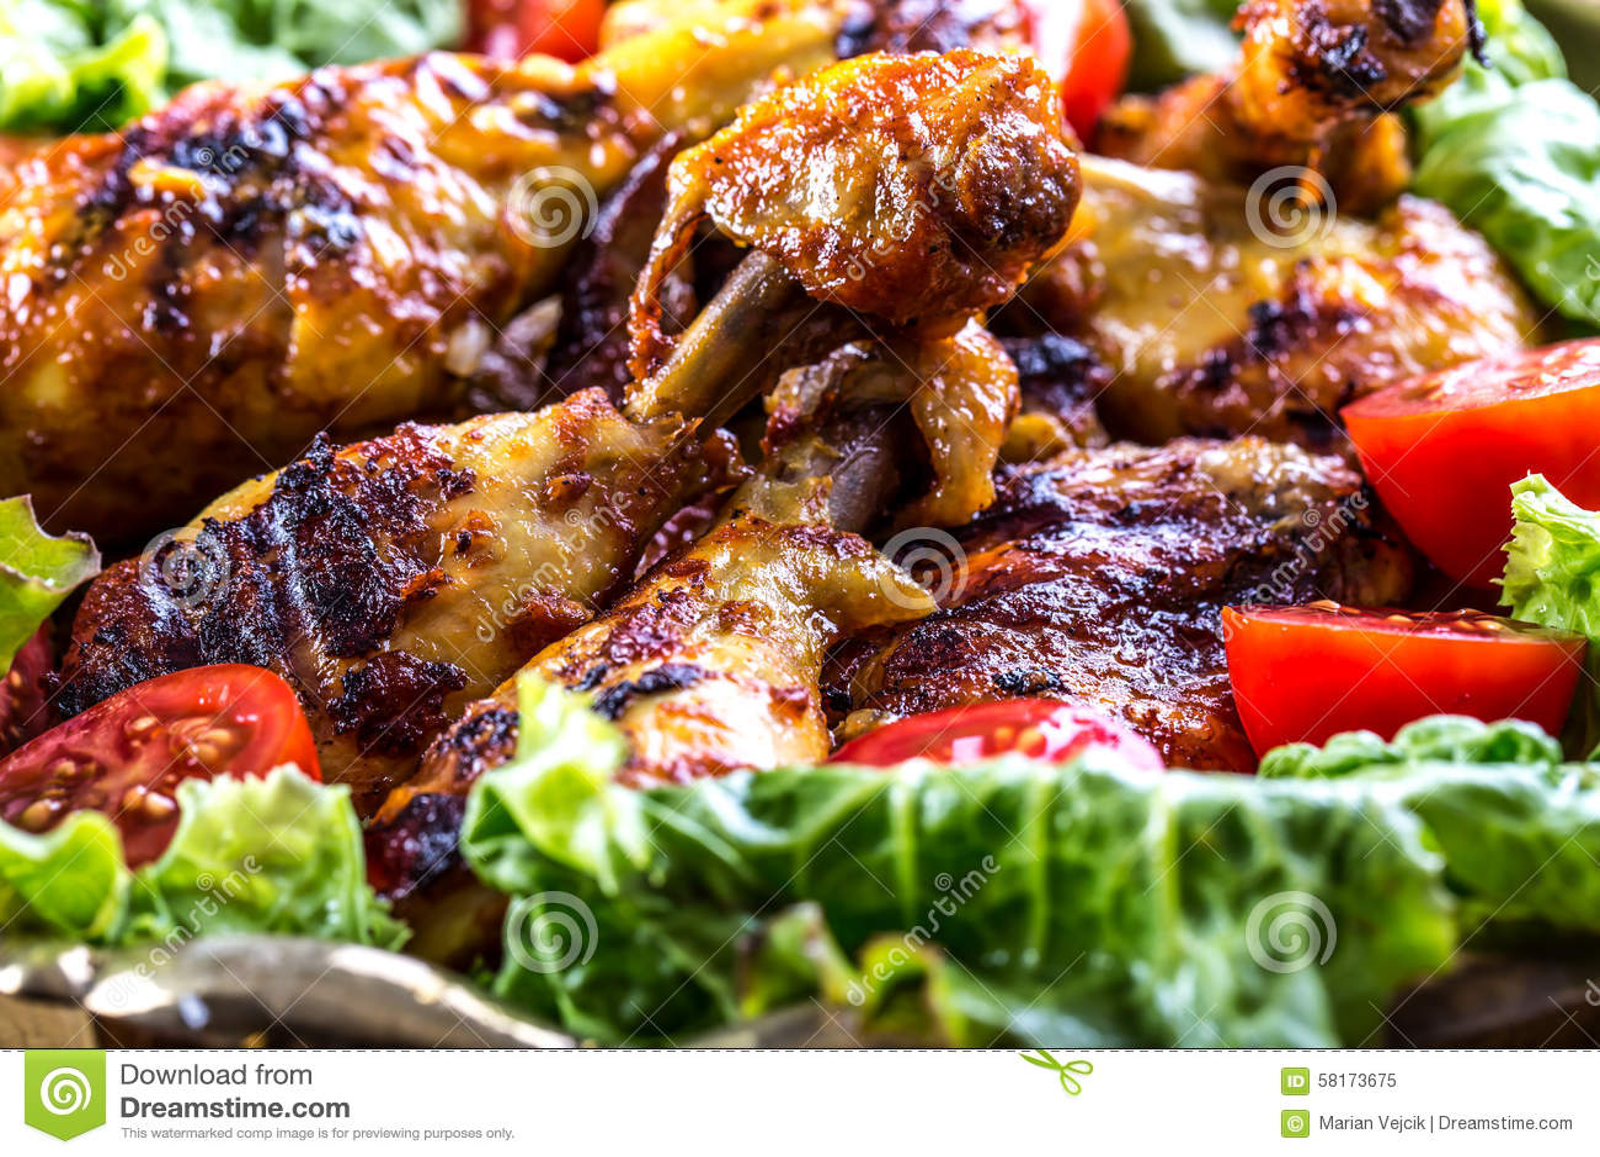 Grilling κοτόπουλο που ψήνεται στη σχάρα ψημένα στη σχάρα κοτόπουλο πόδια Ψημένα στη σχάρα πόδια κοτόπουλου, ντομάτες μαρουλιού κ